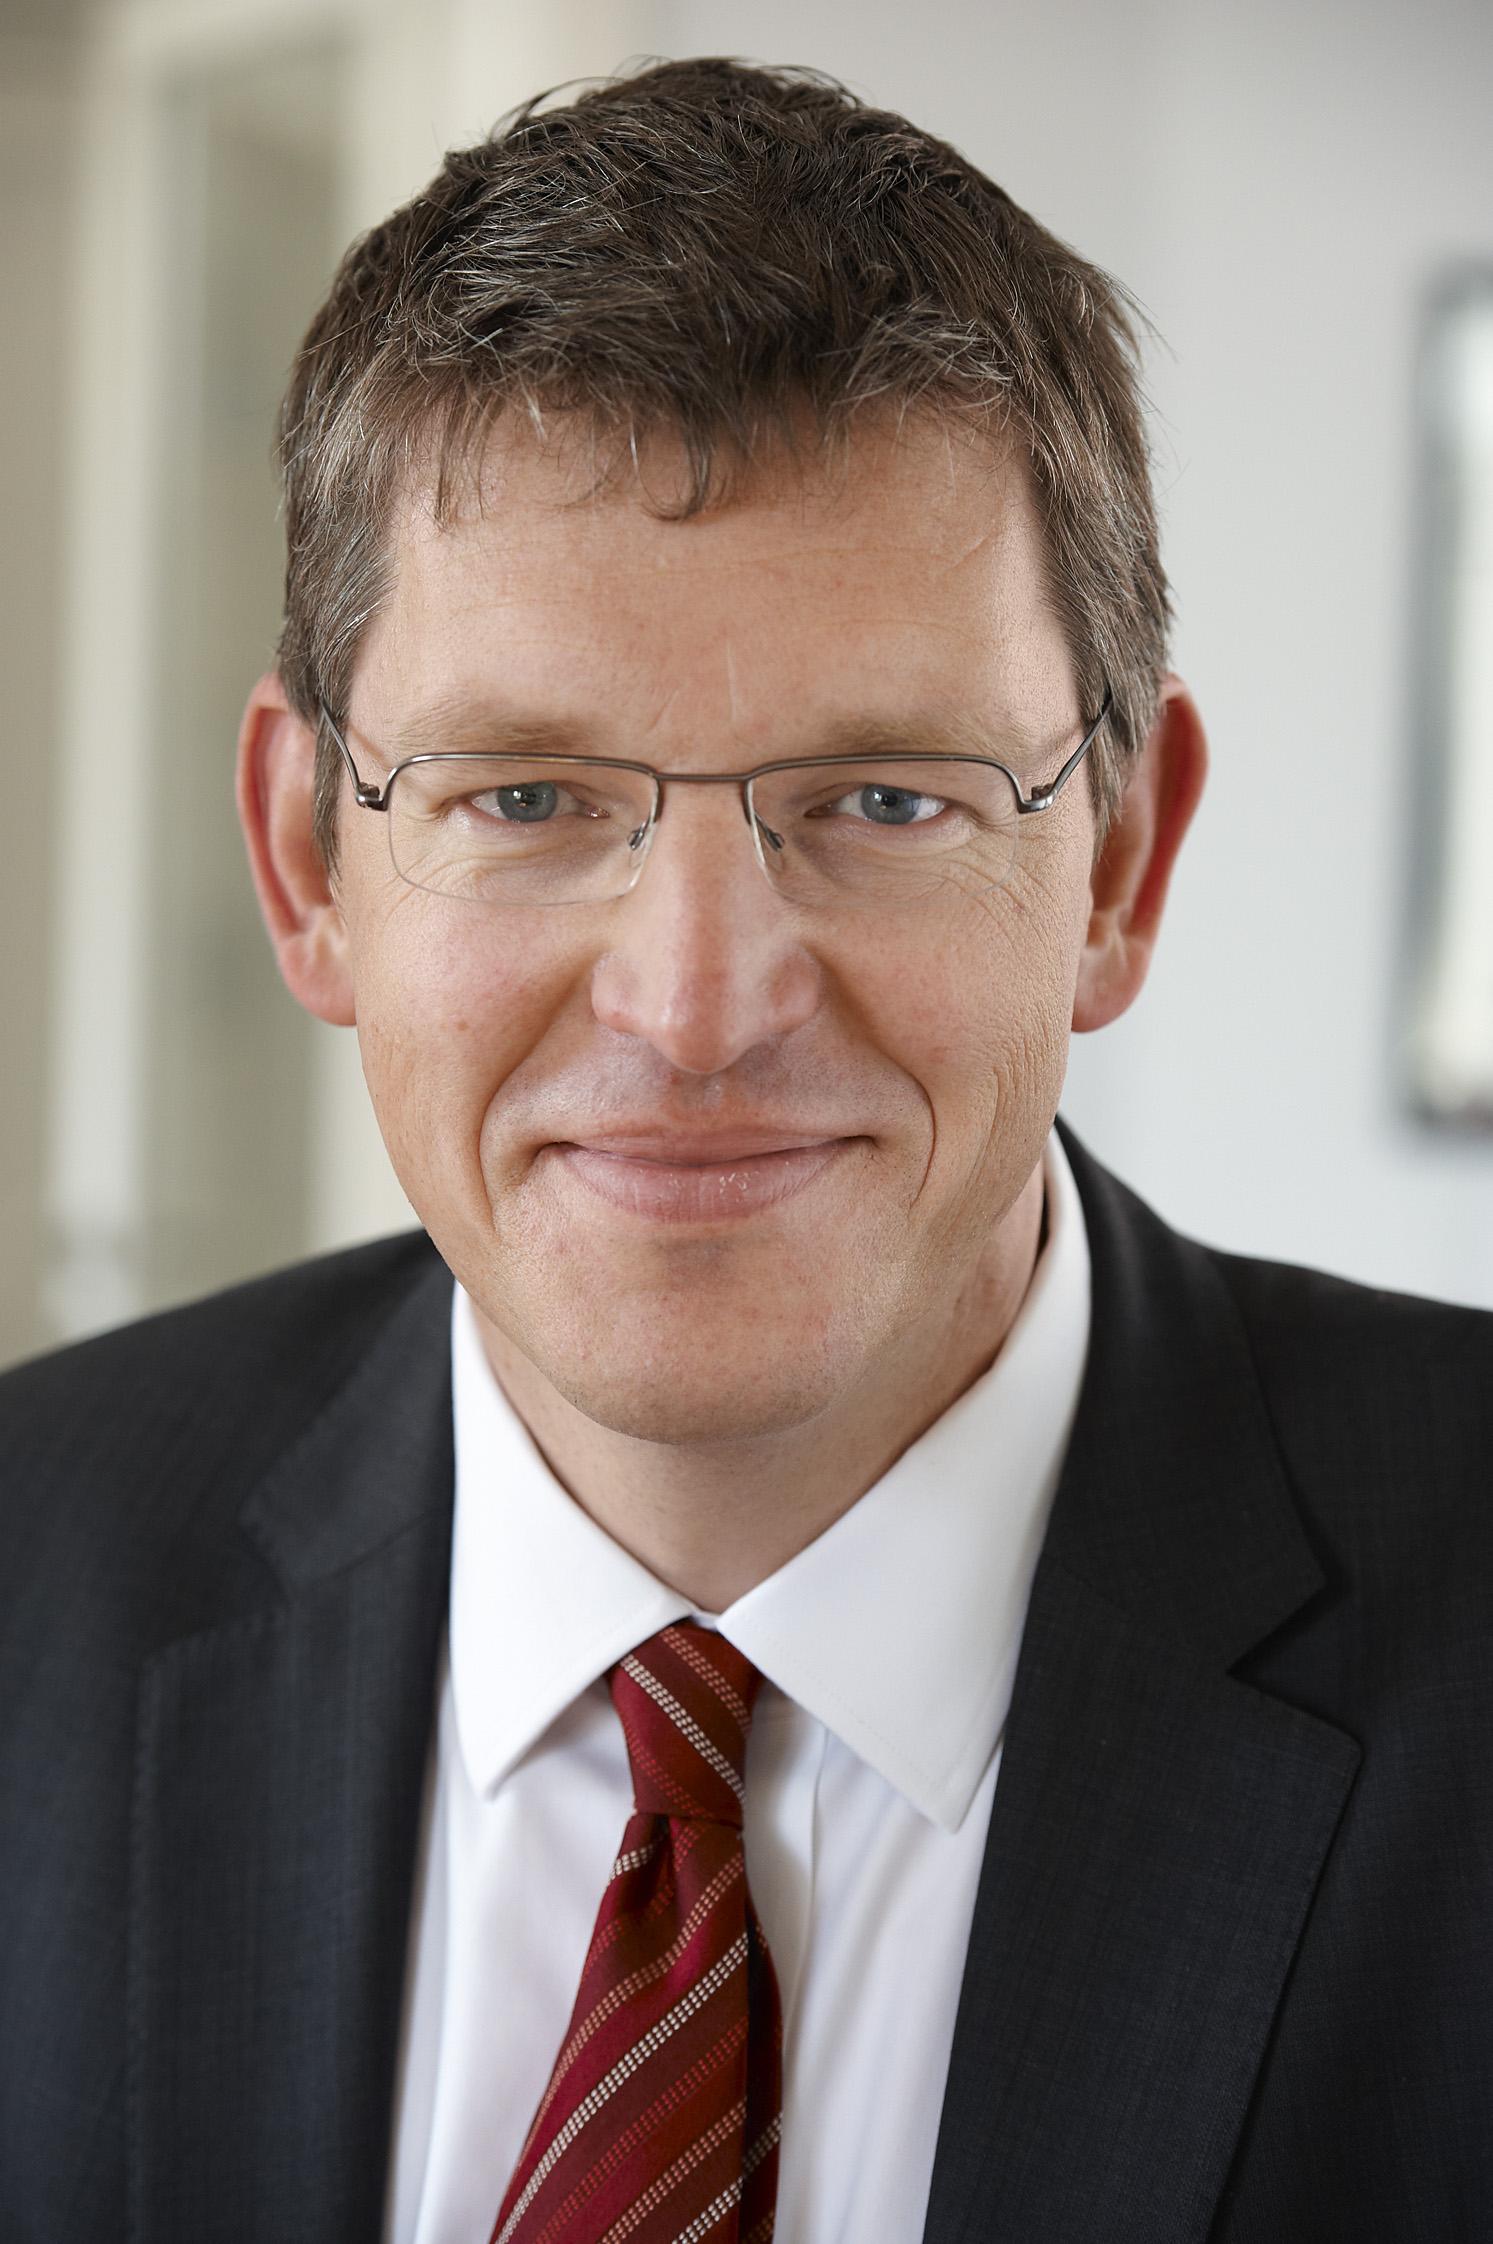 Christian Hoßbach, Vorsitzender DGB Berlin-Brandenburg